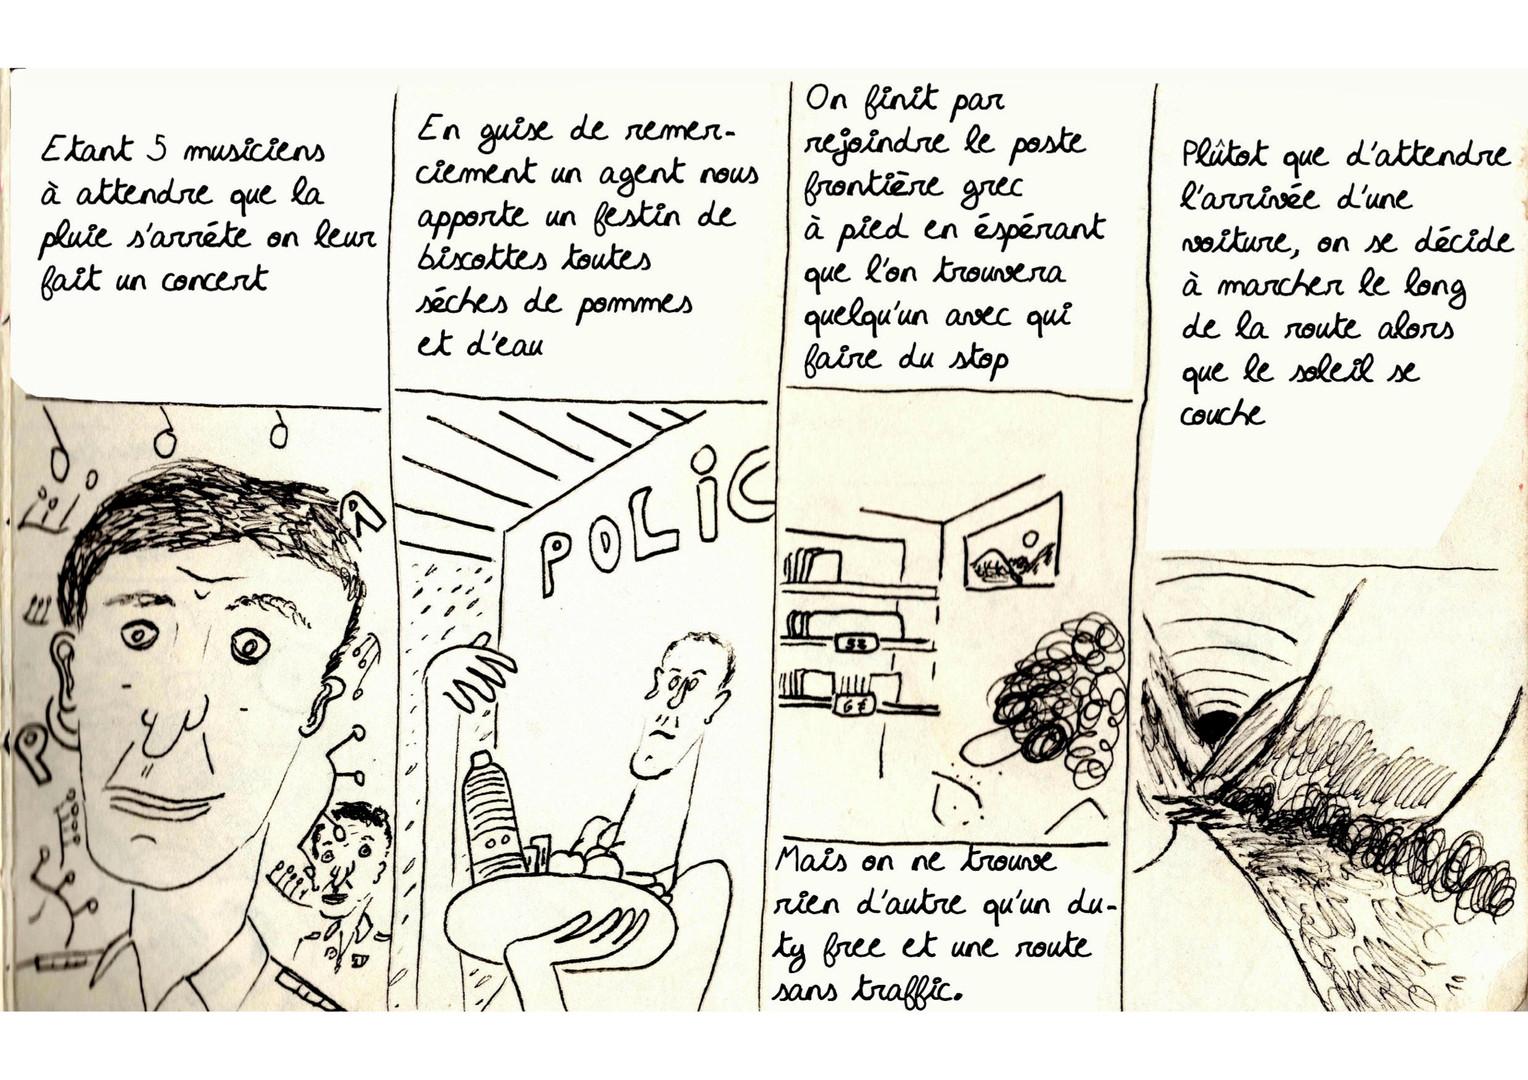 p34.jpg